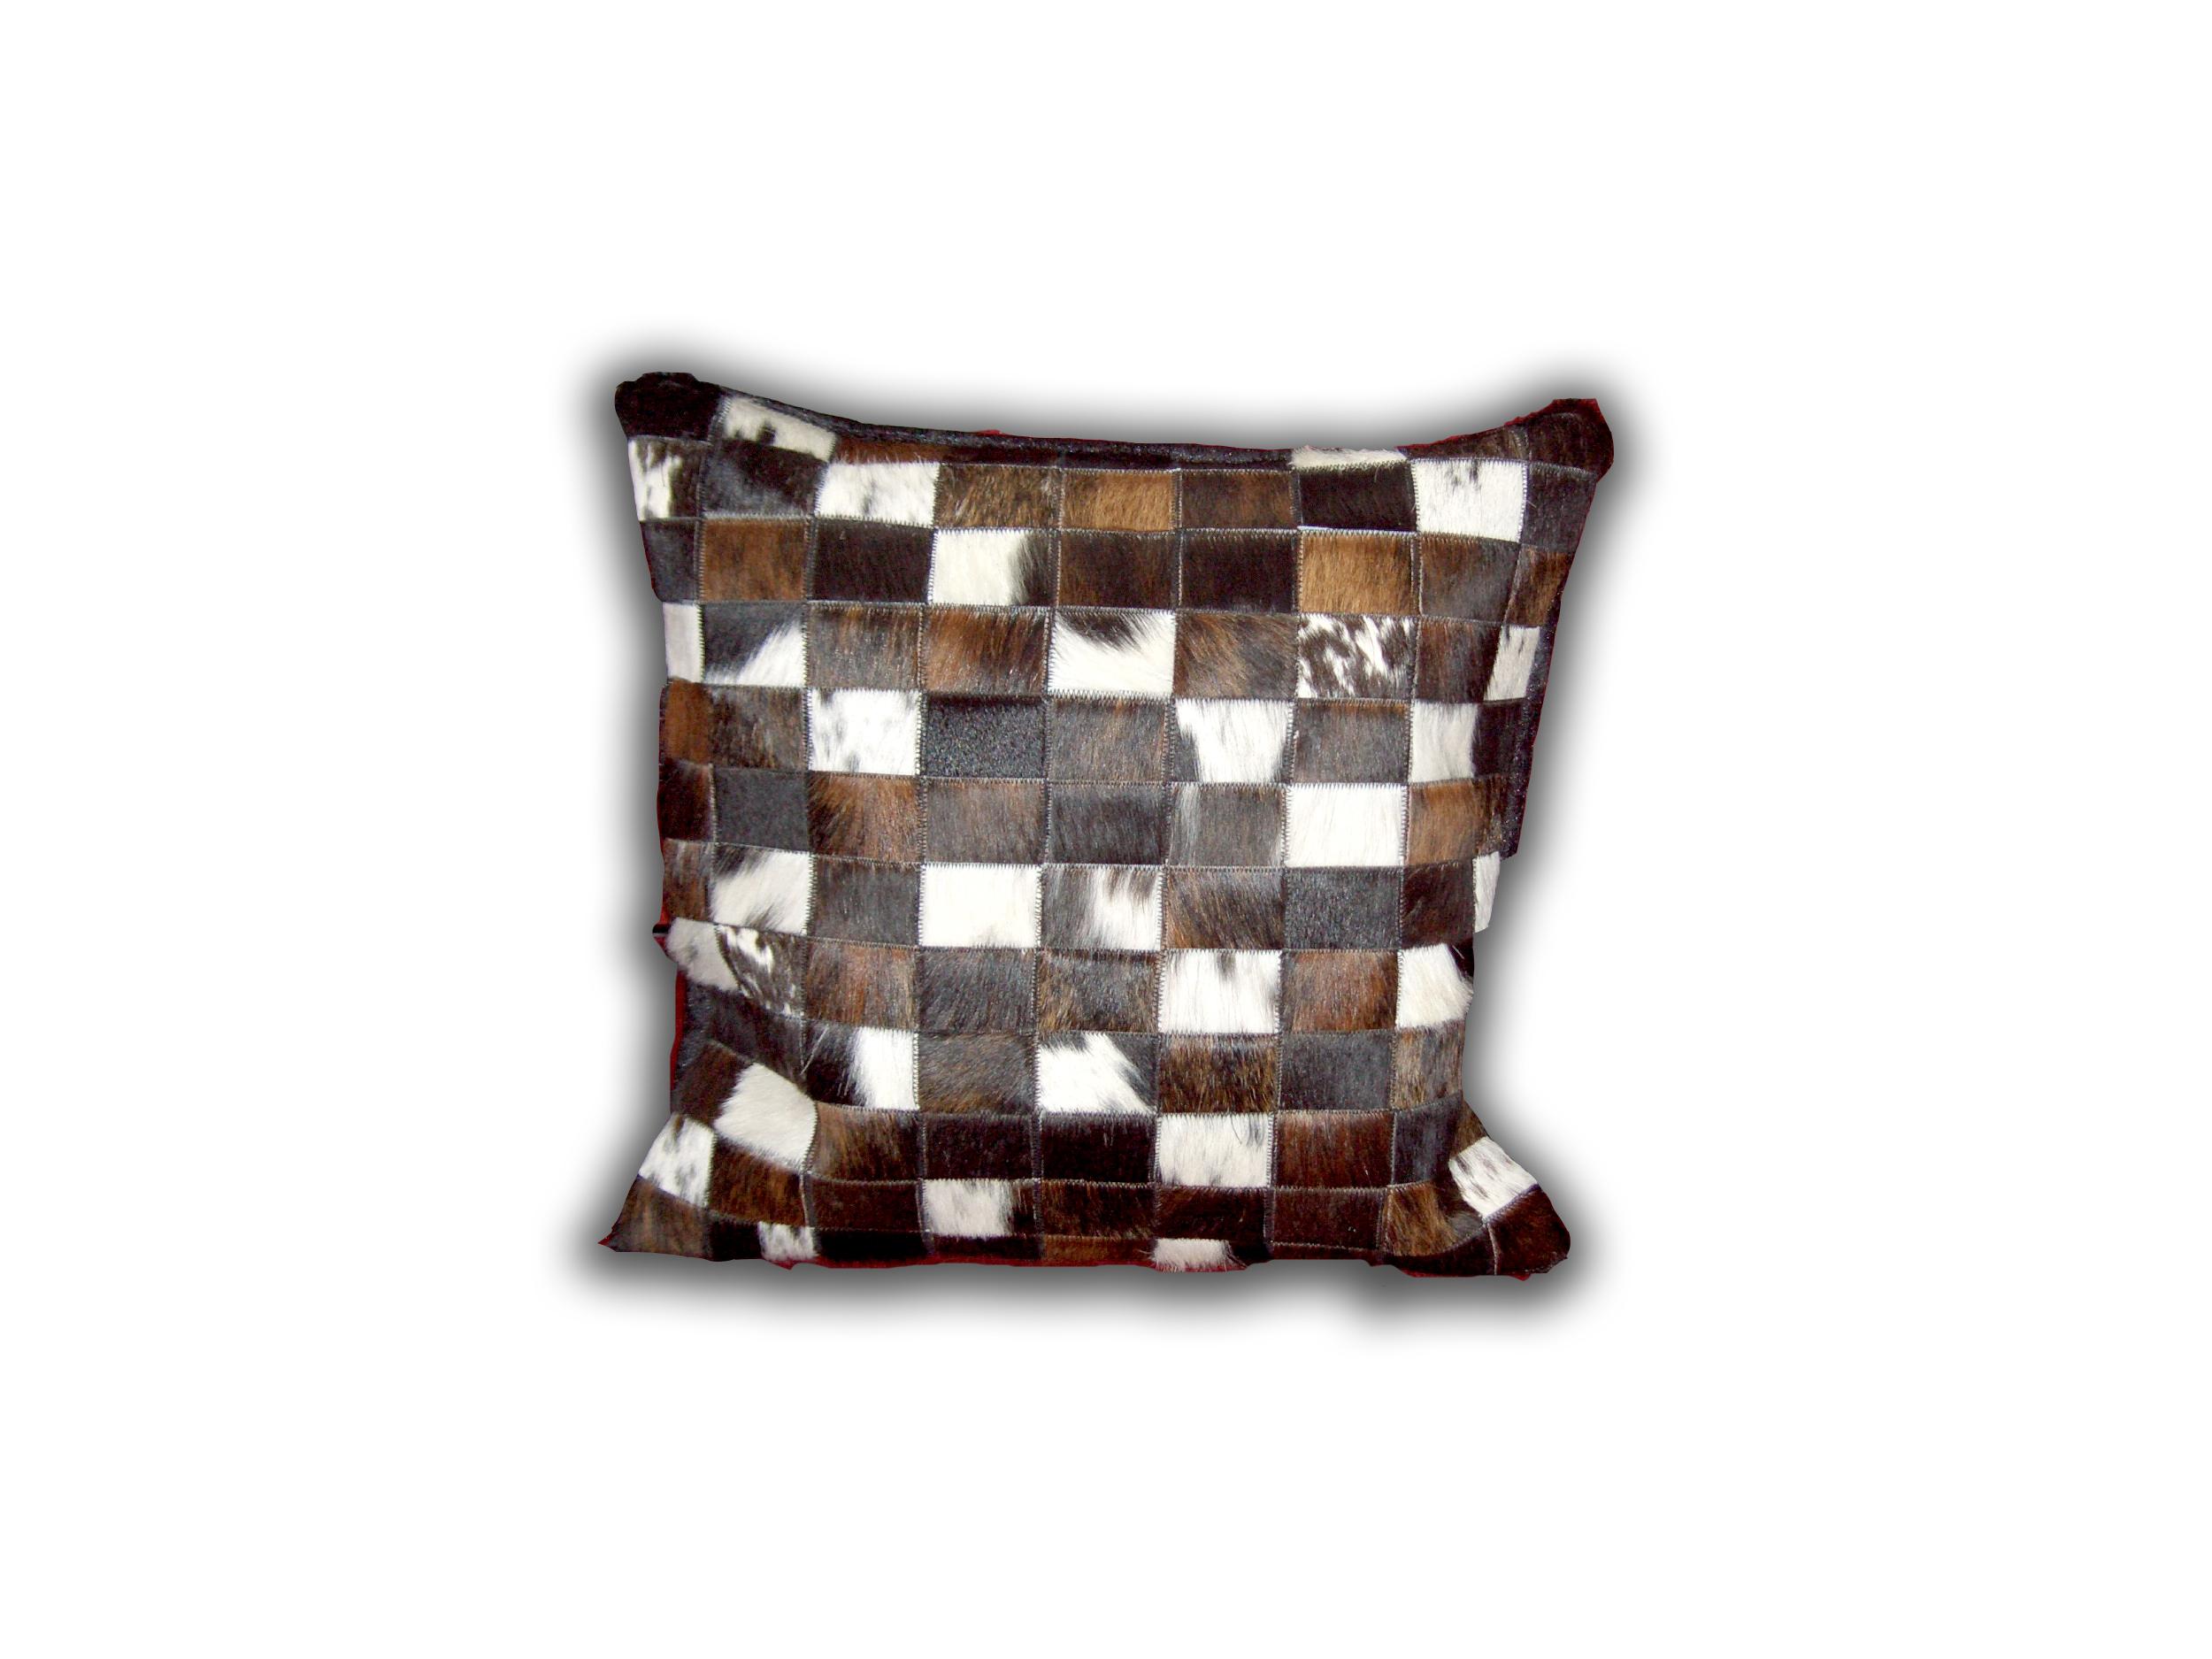 produkt fellkissen devich holzschuherzeugung gmbh. Black Bedroom Furniture Sets. Home Design Ideas